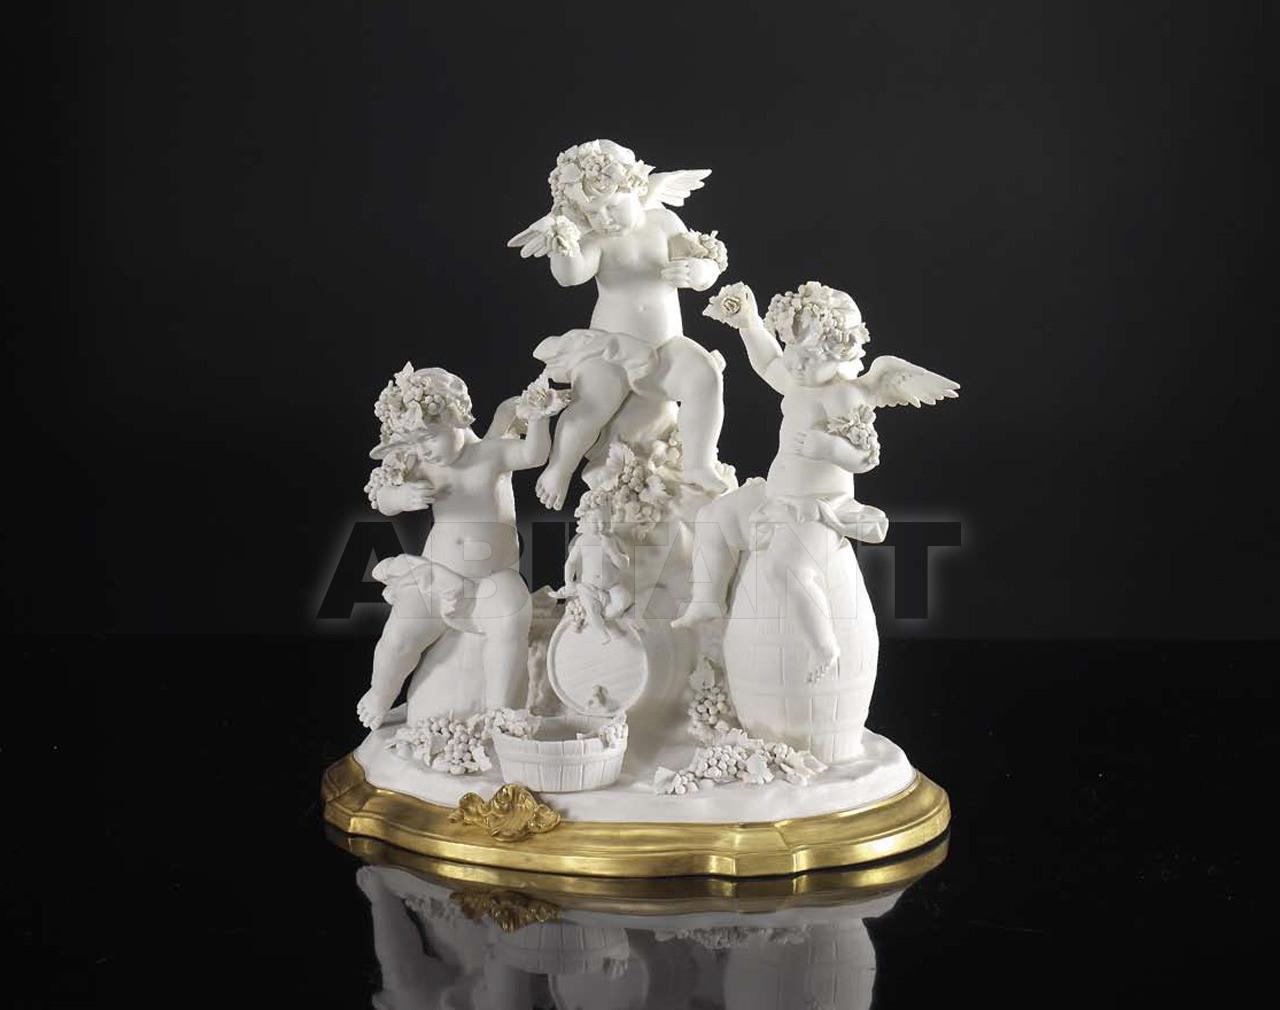 Купить Статуэтка SMALL SIZE GISELLE AUTUMN Villari Capodimonte 0001560-007